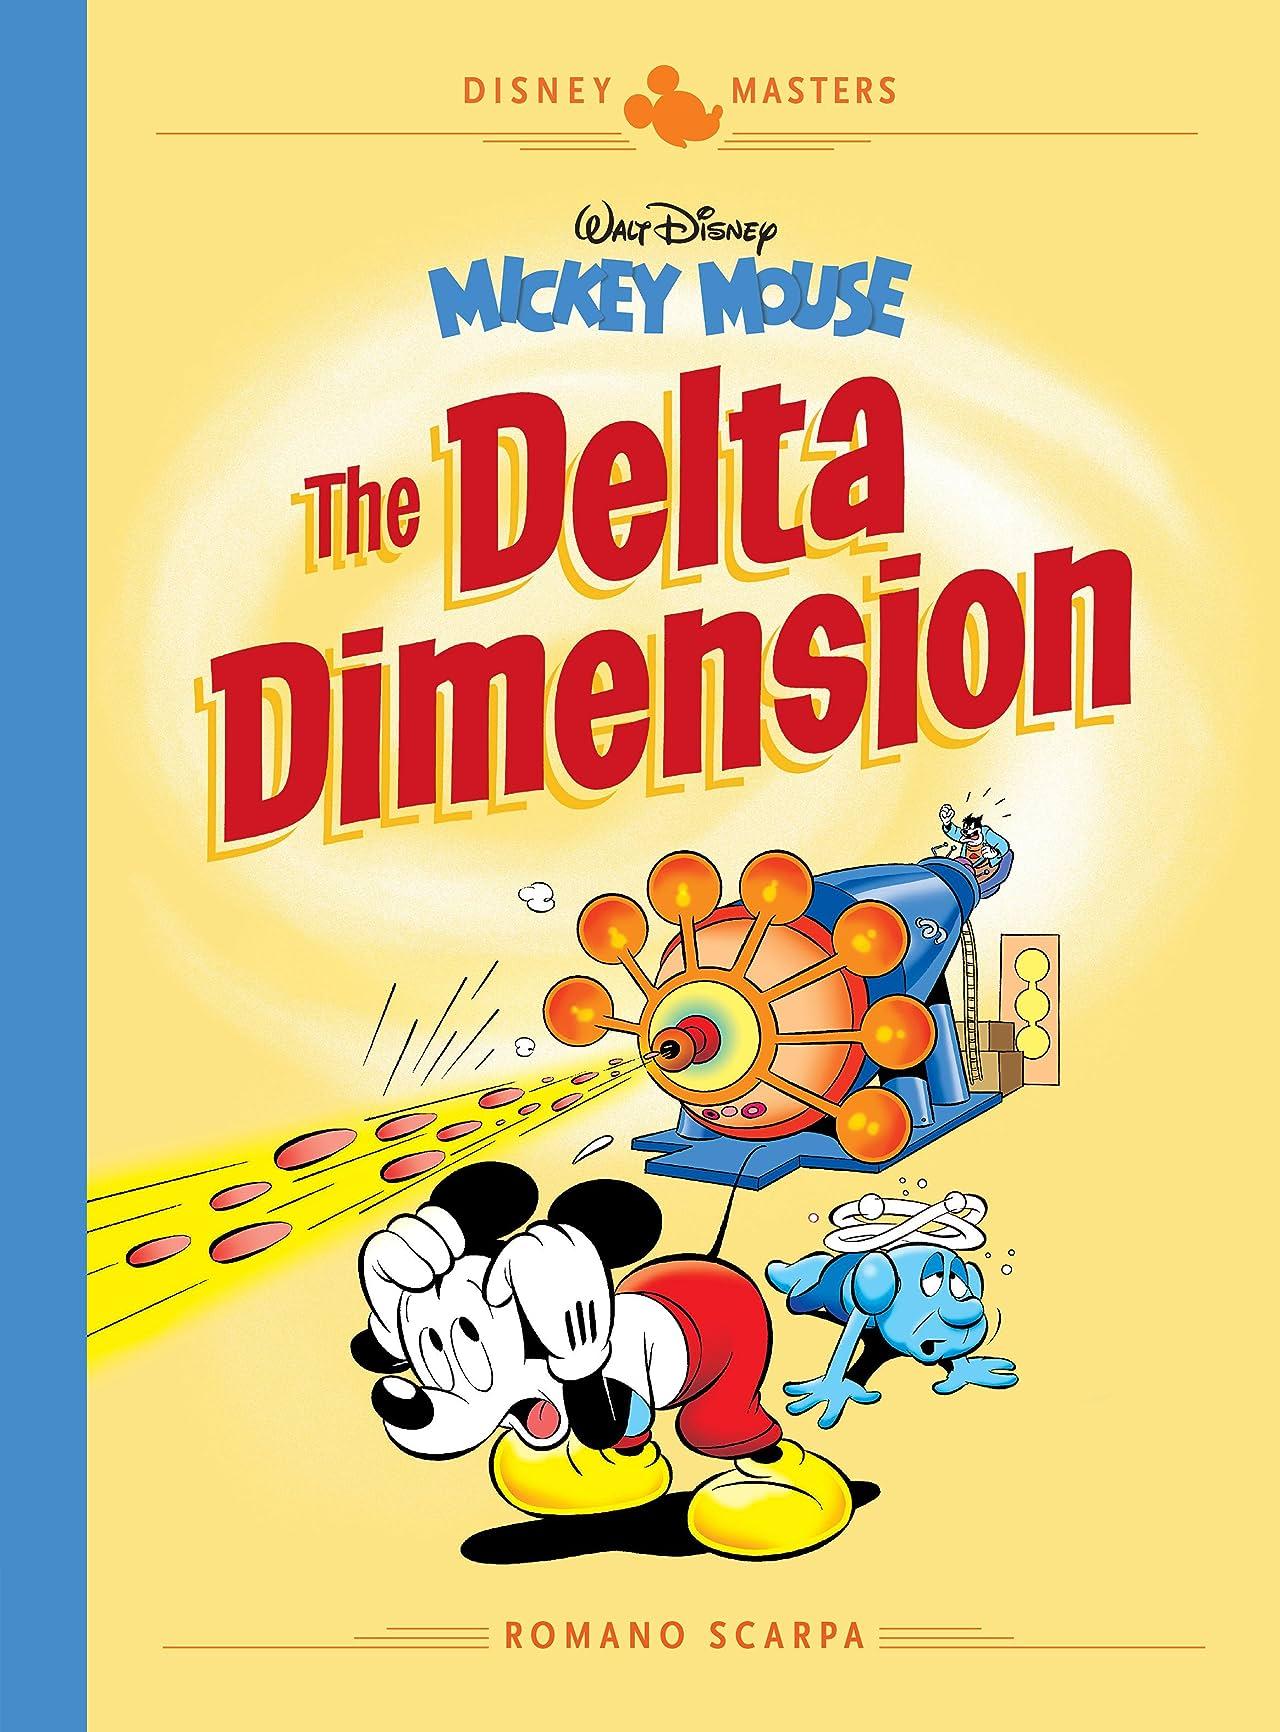 Disney Masters Vol. 1: Walt Disney's Mickey Mouse: The Delta Dimension